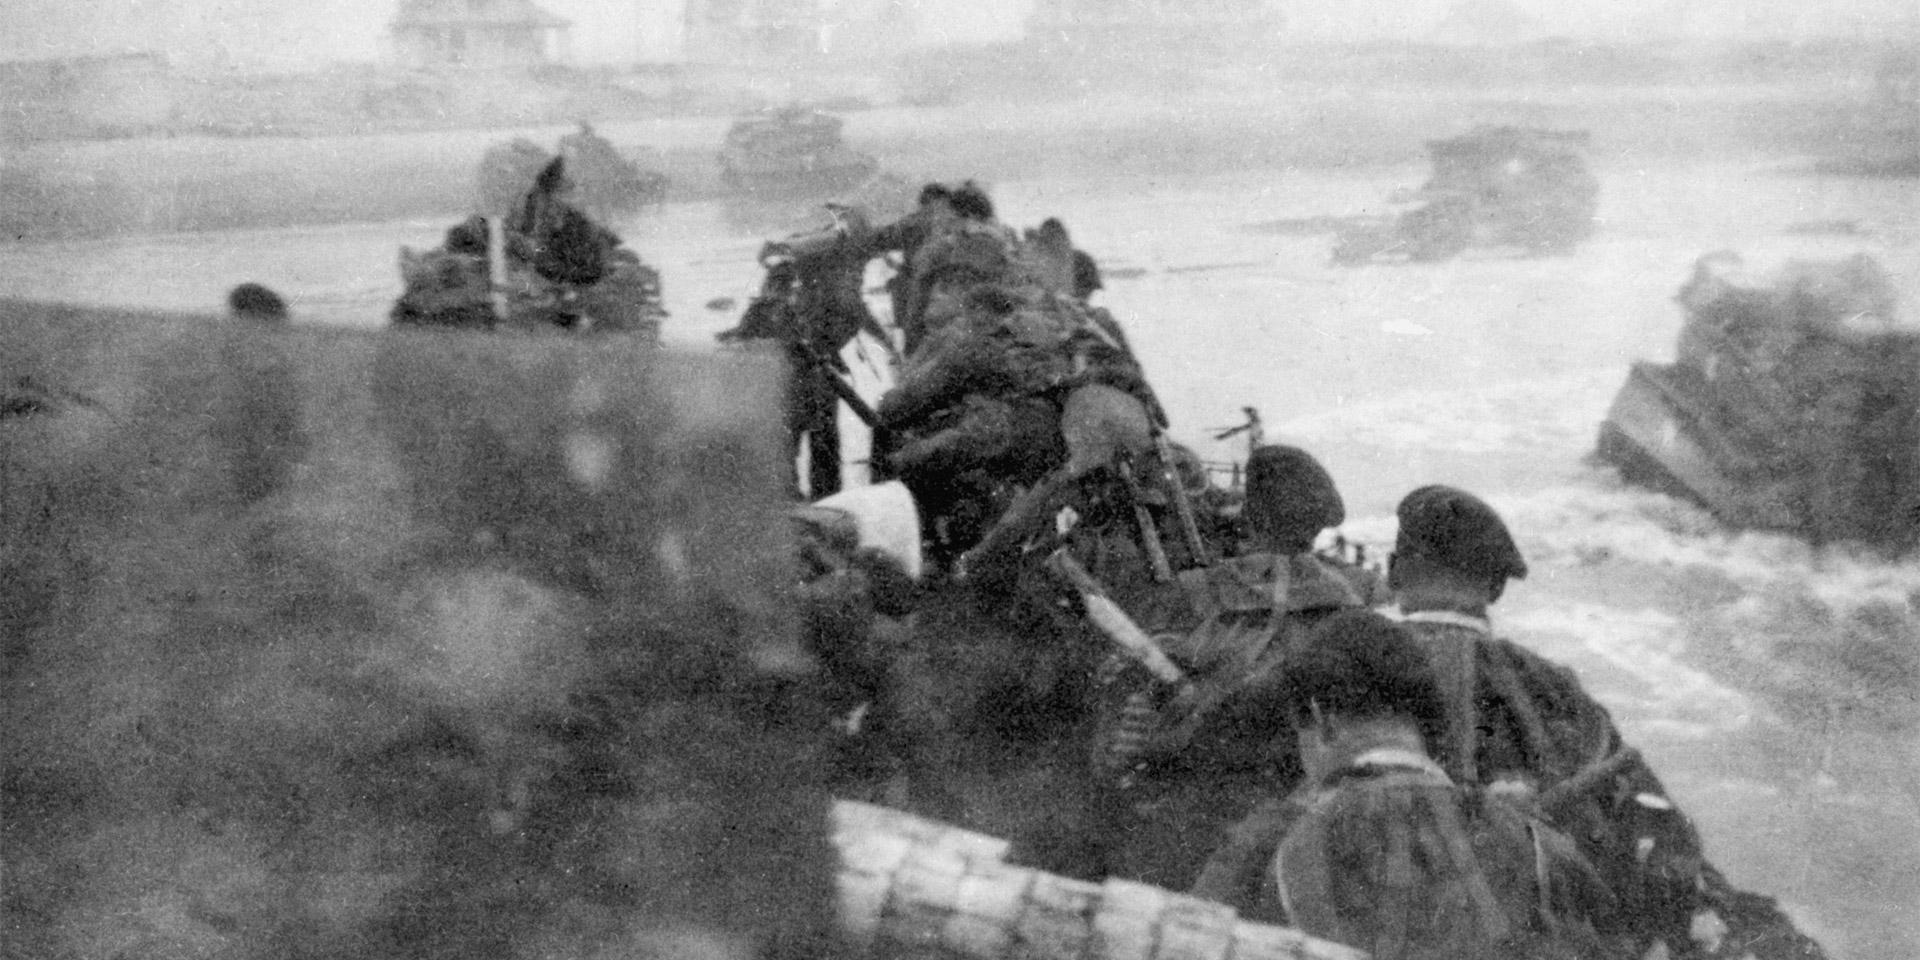 British troops landing at Sword Beach, 6 June 1944